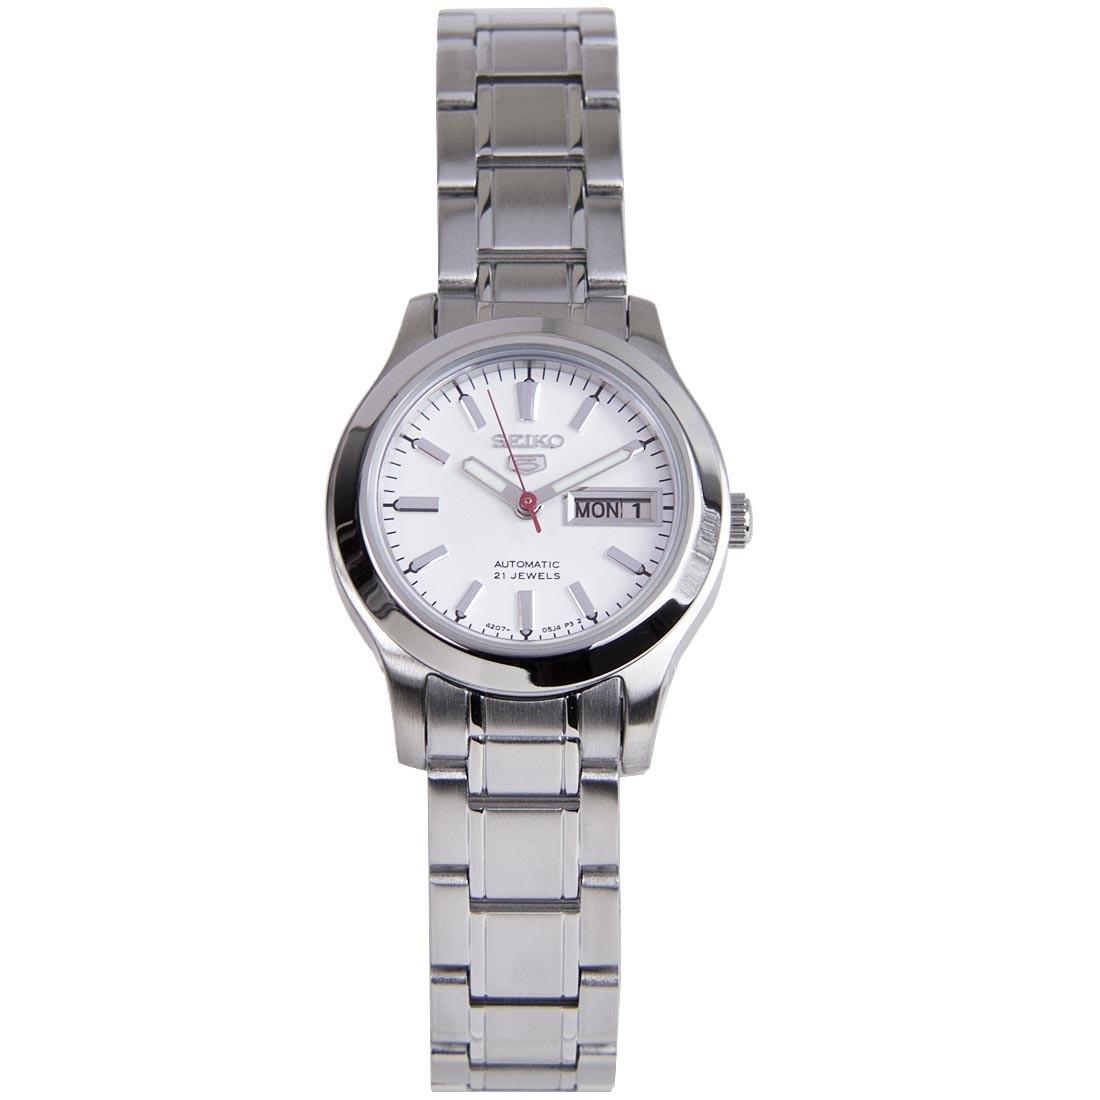 Seikosymd87k1 Symd87k Symd87 Seiko 5 Automatic White Dial Stainless Steel Strap Ladies Dress Watch